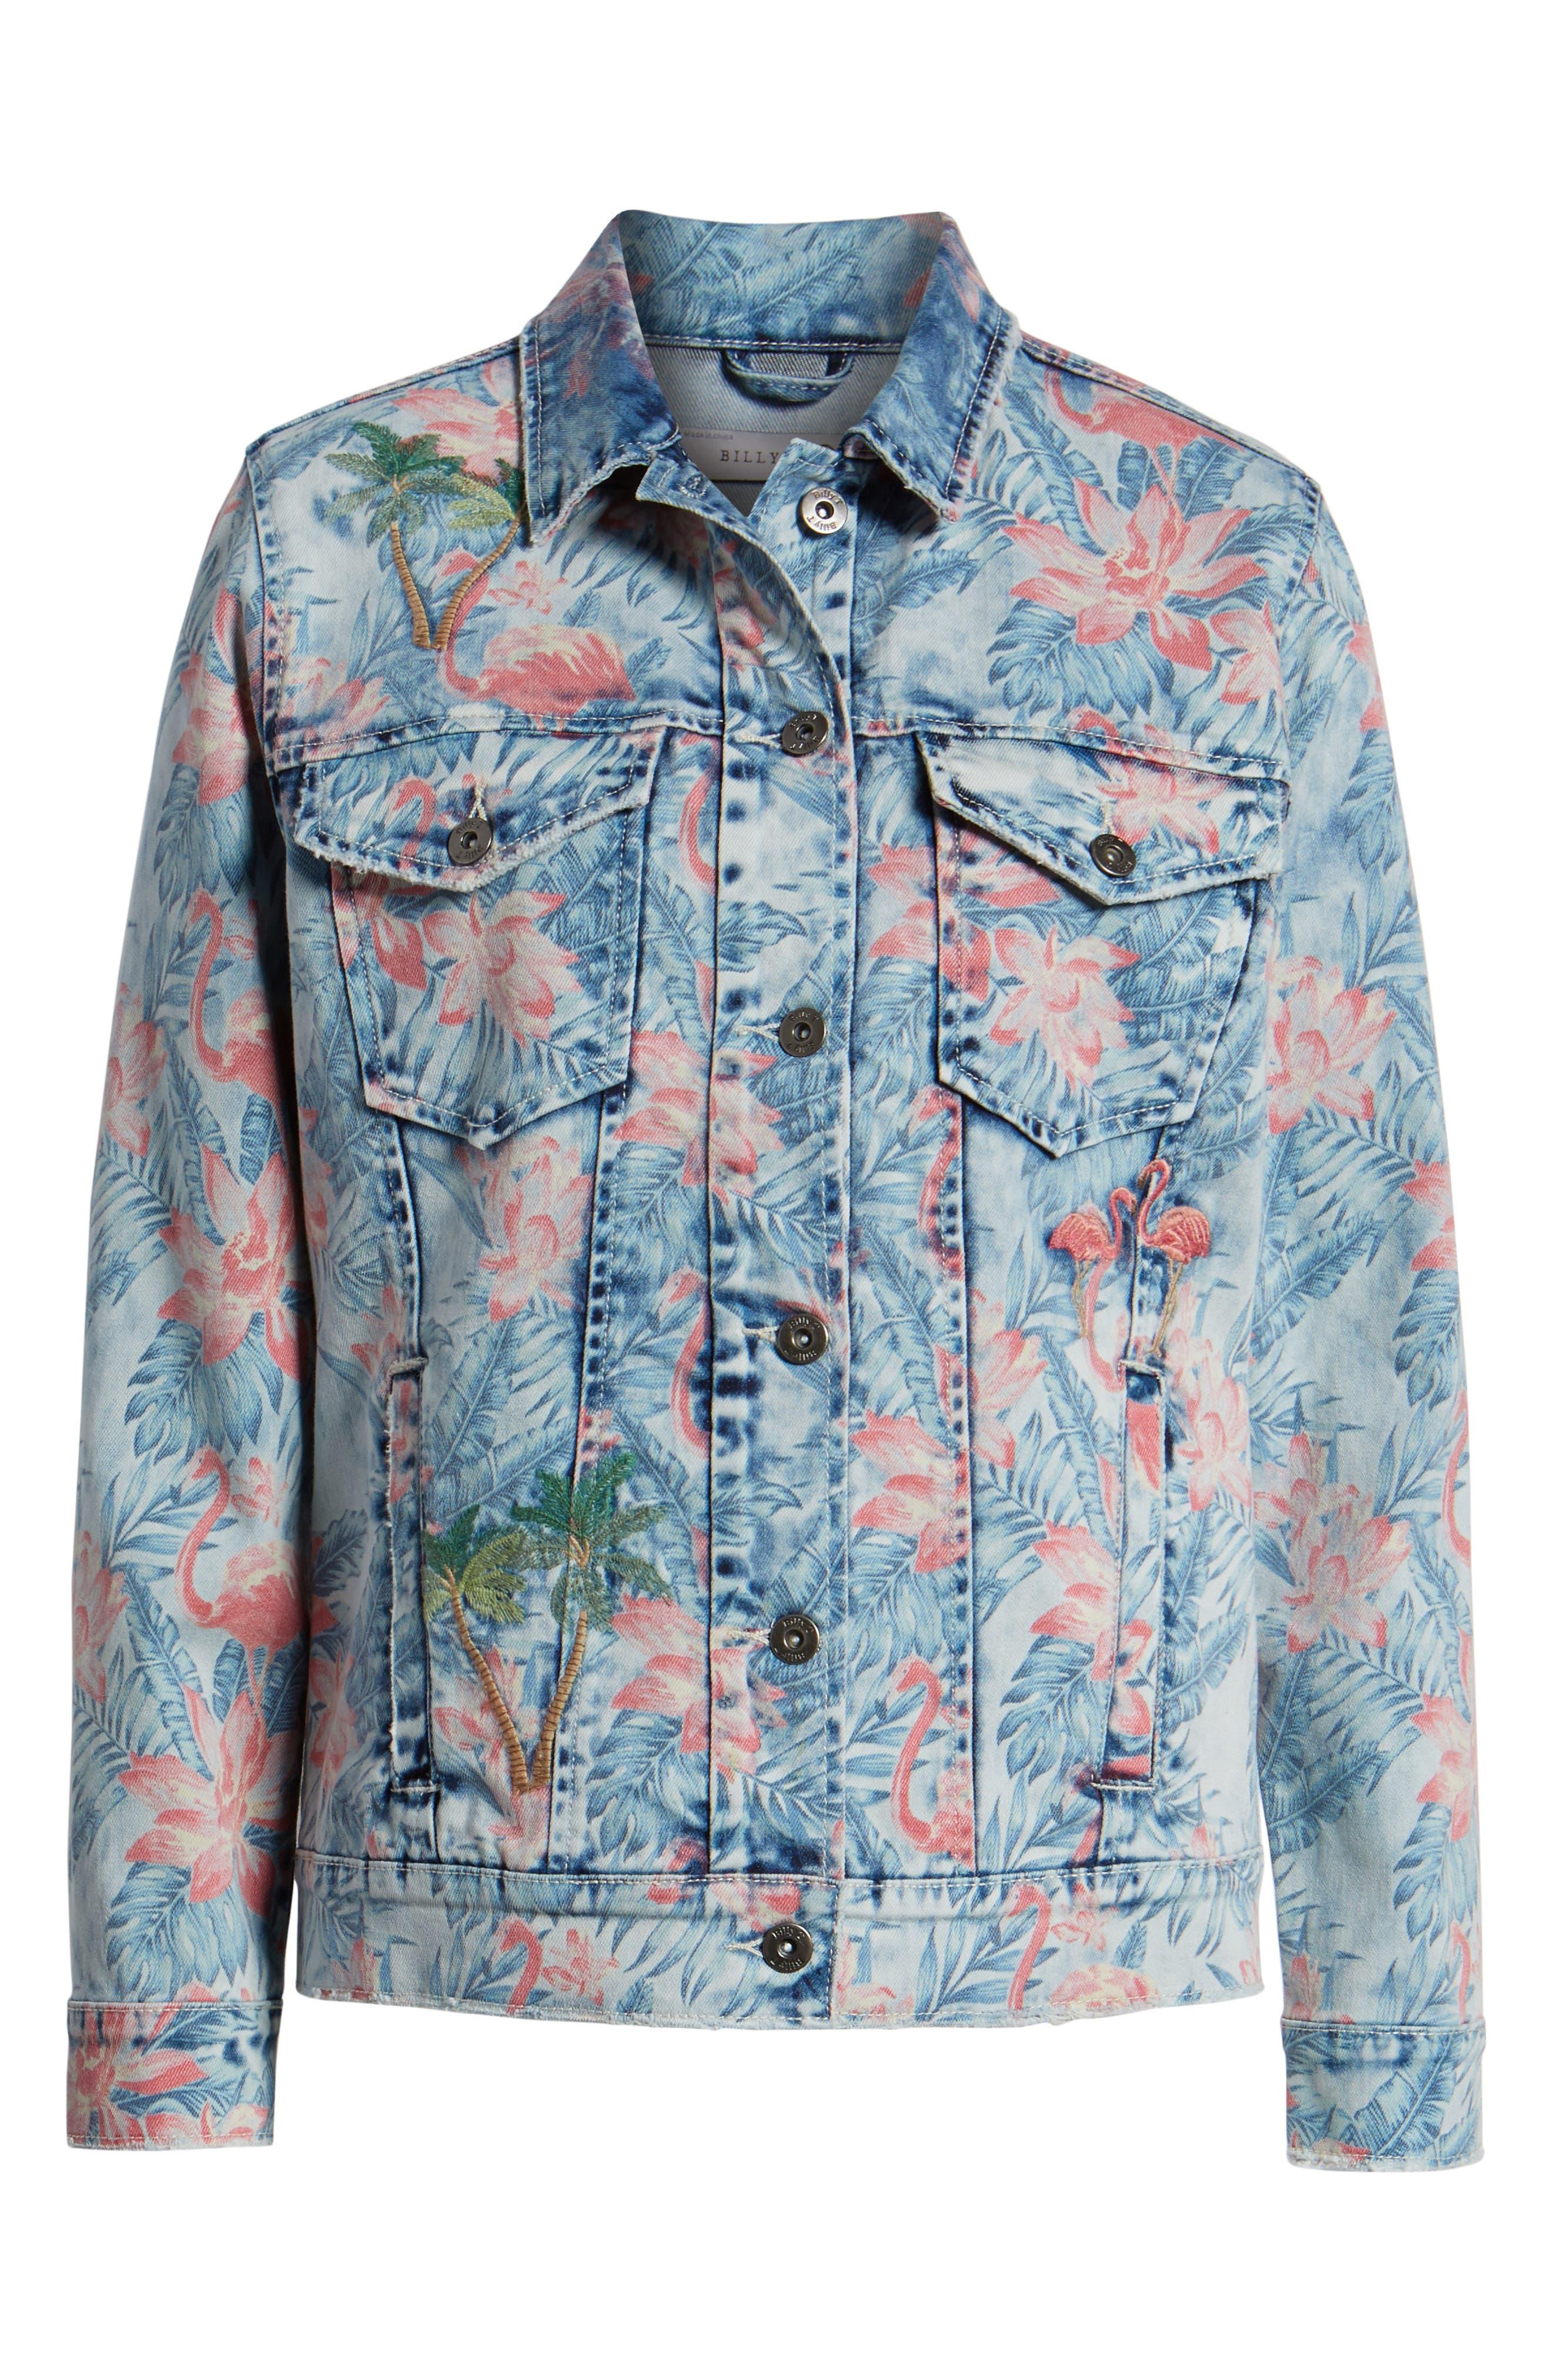 Embroidered Floral Denim Jacket,                             Alternate thumbnail 7, color,                             Light Blue Paradise